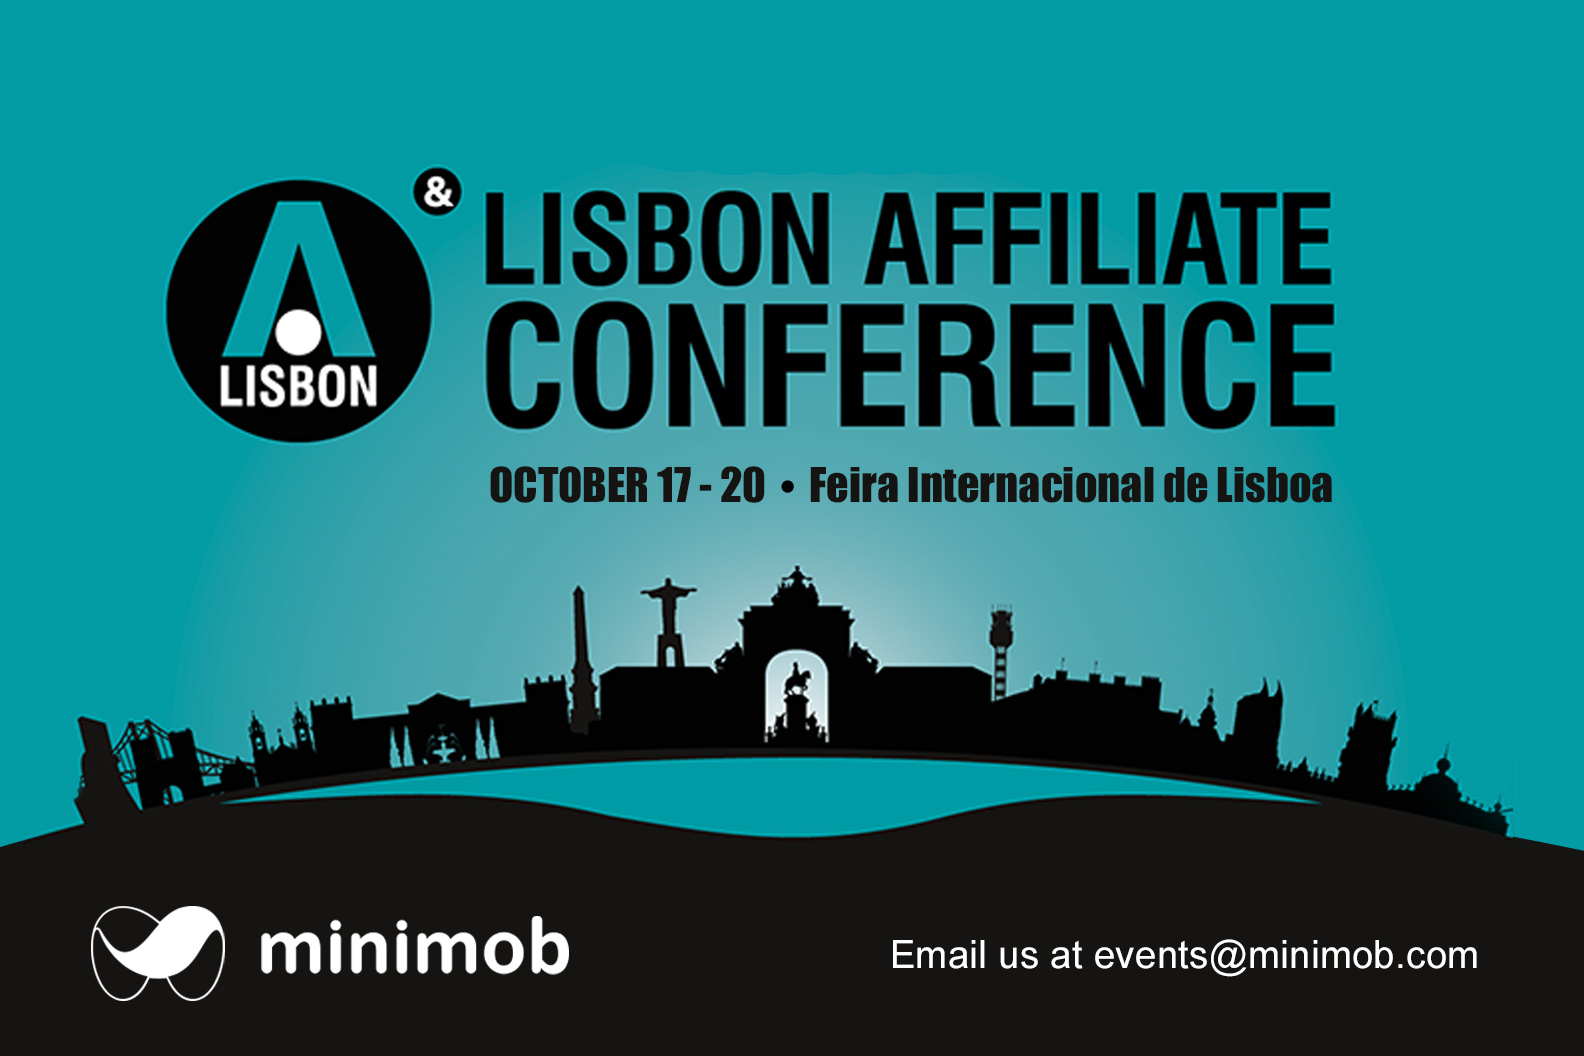 Lisbon_Affiliate-2018_linkedin_792x528_2x